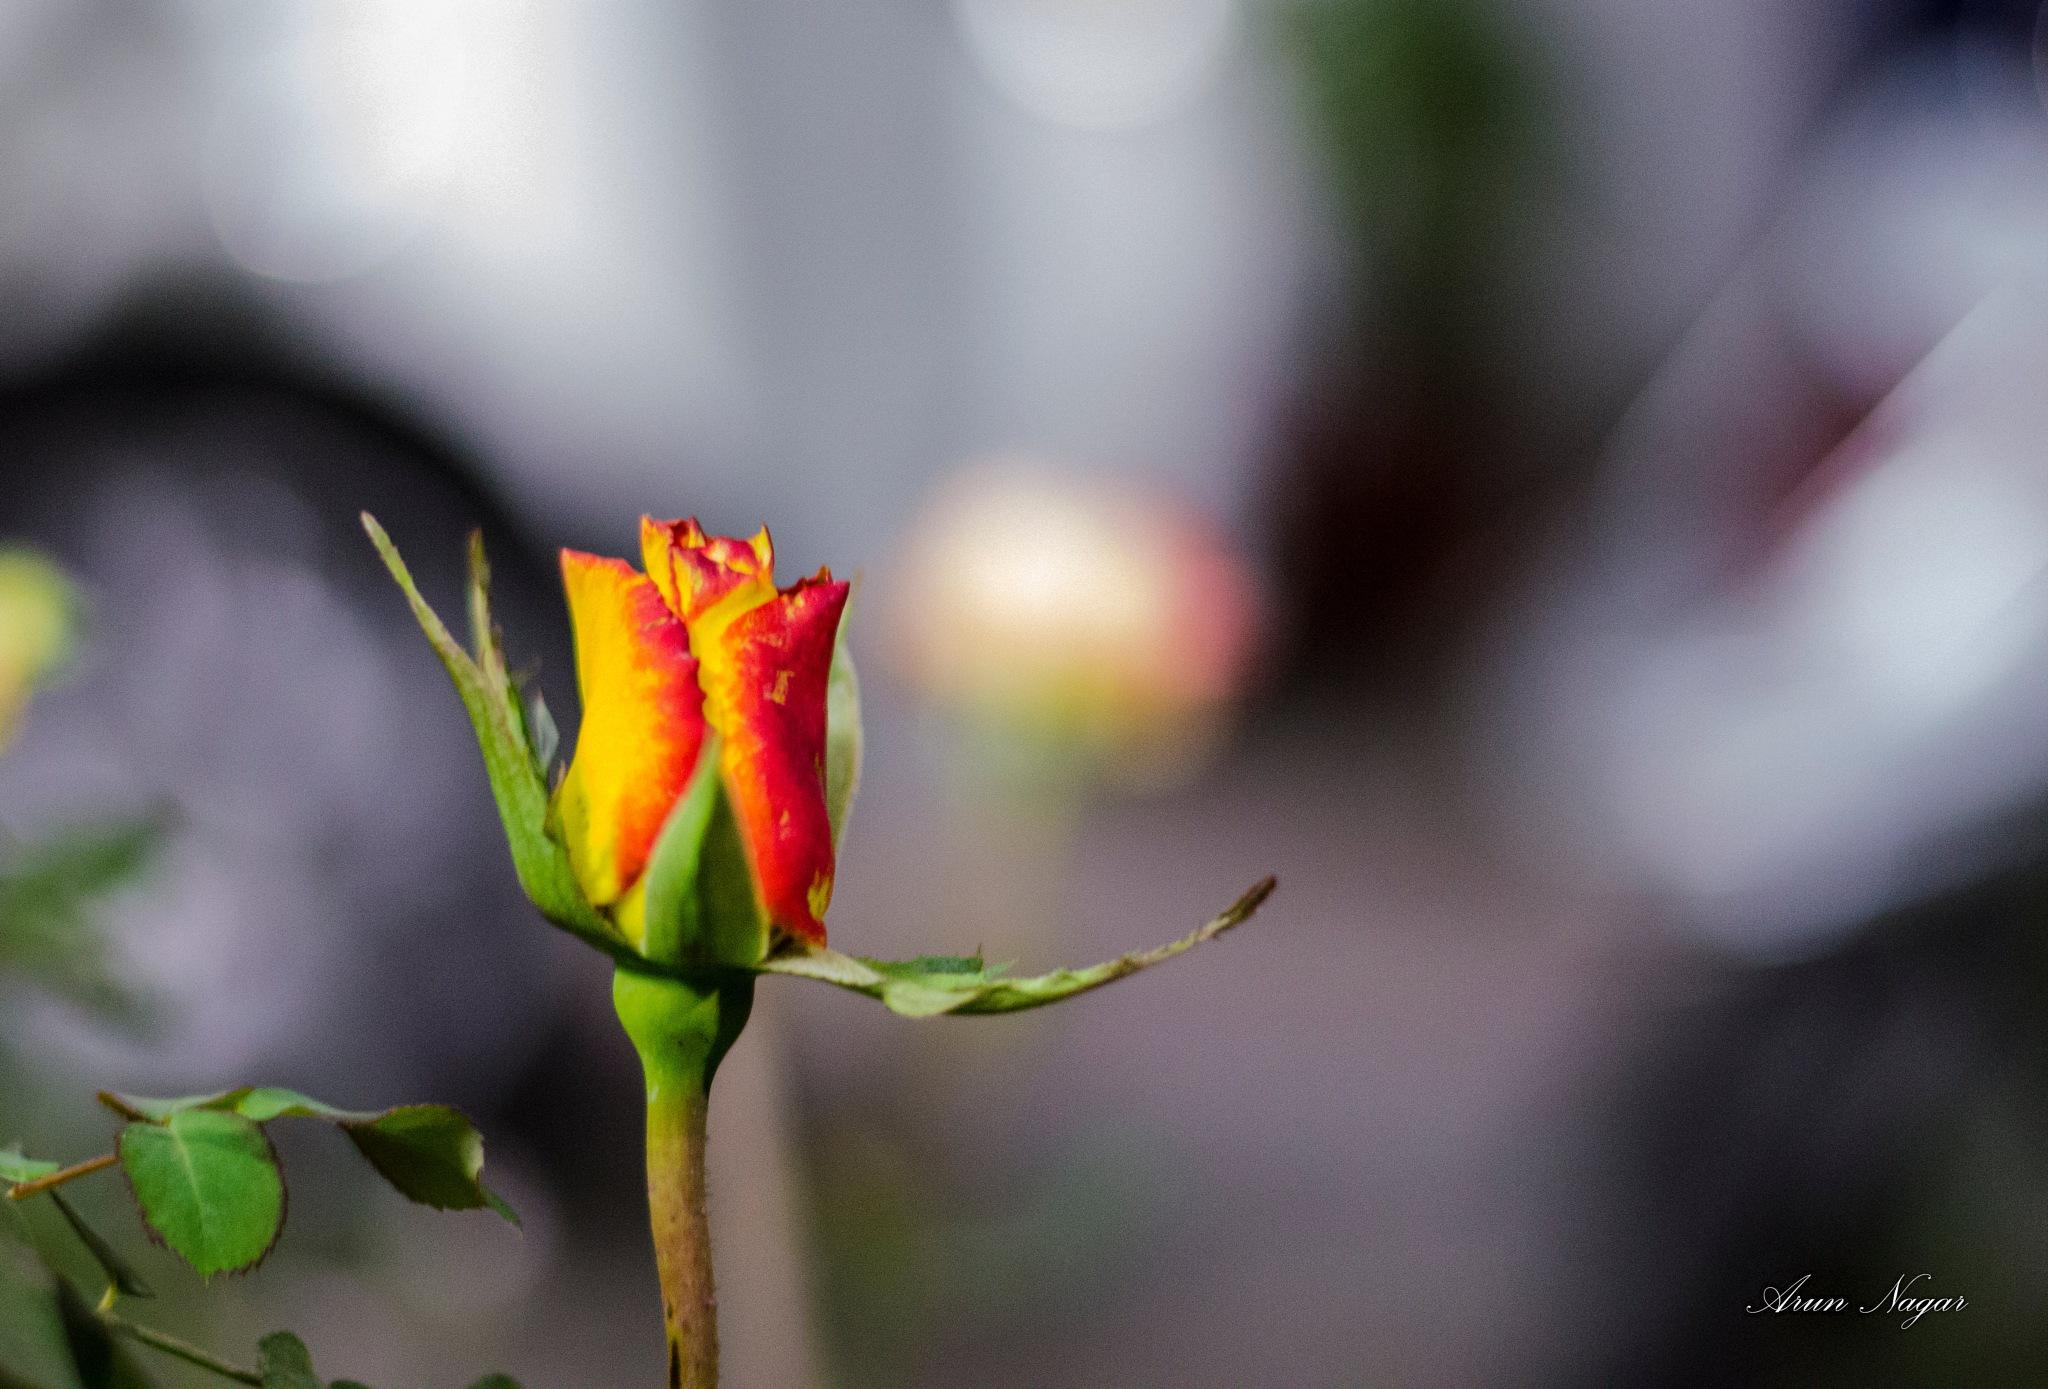 Tomorrow it will be called Rose by Arun Nagar